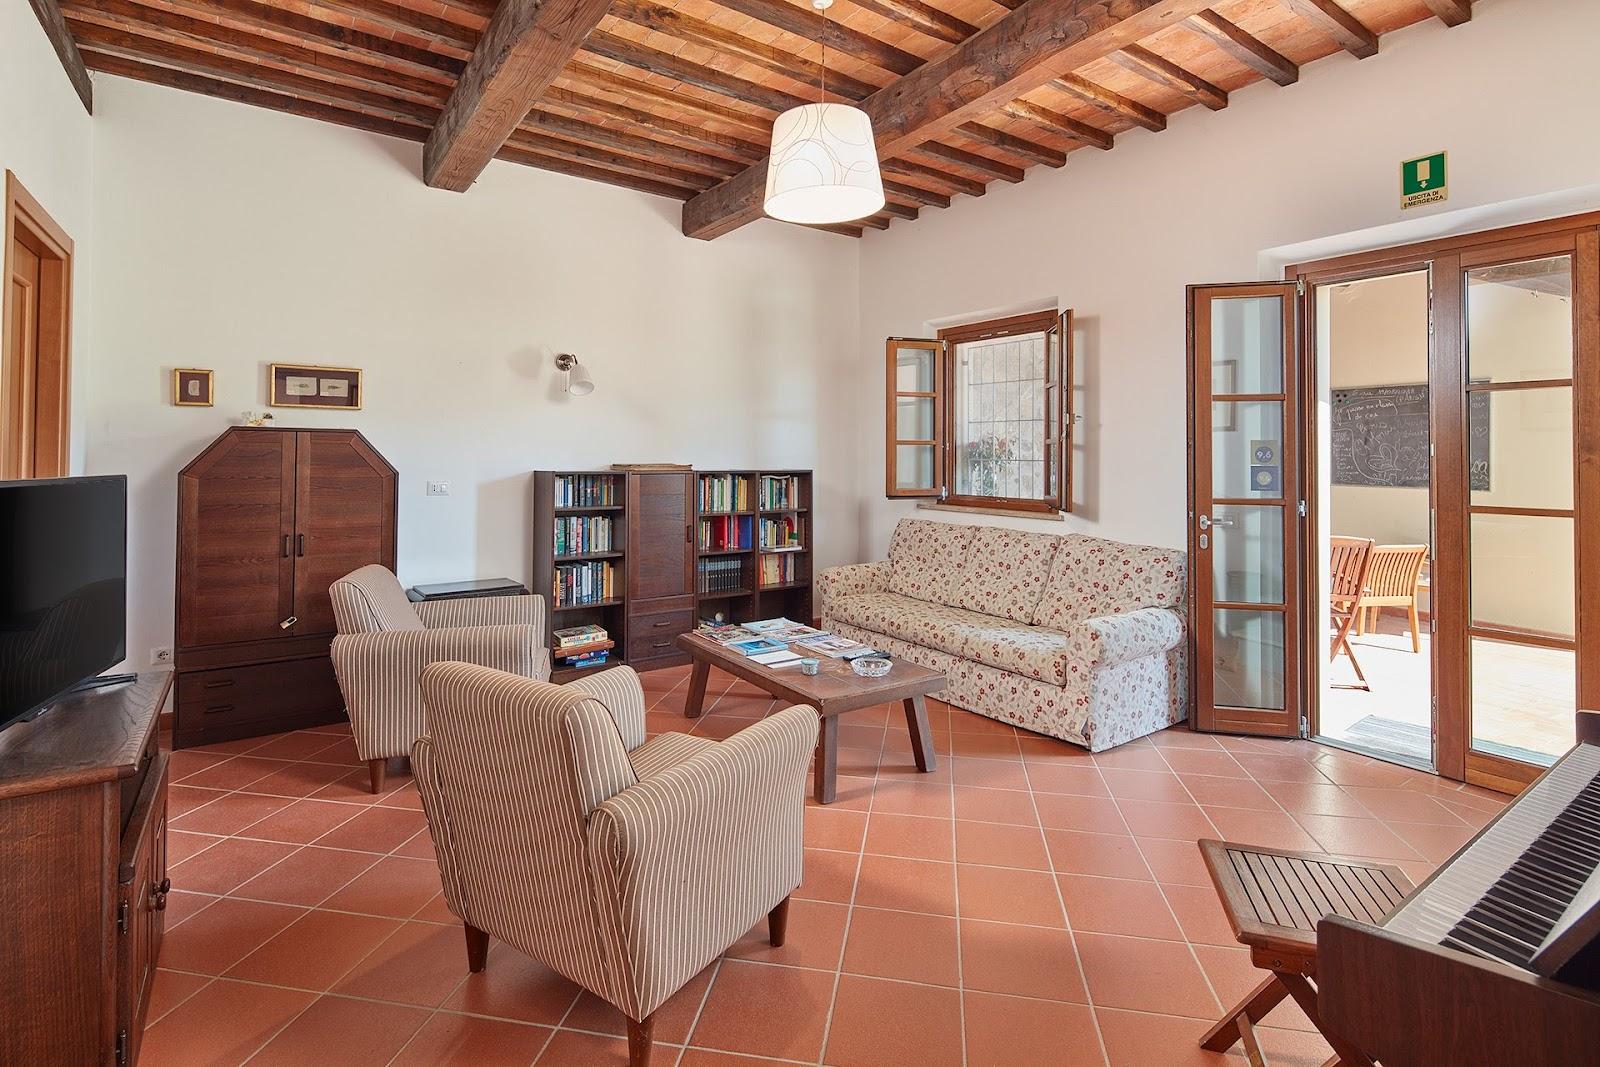 Ferienhaus Corte Paradiso (2570342), Monsummano Terme, Pistoia, Toskana, Italien, Bild 18